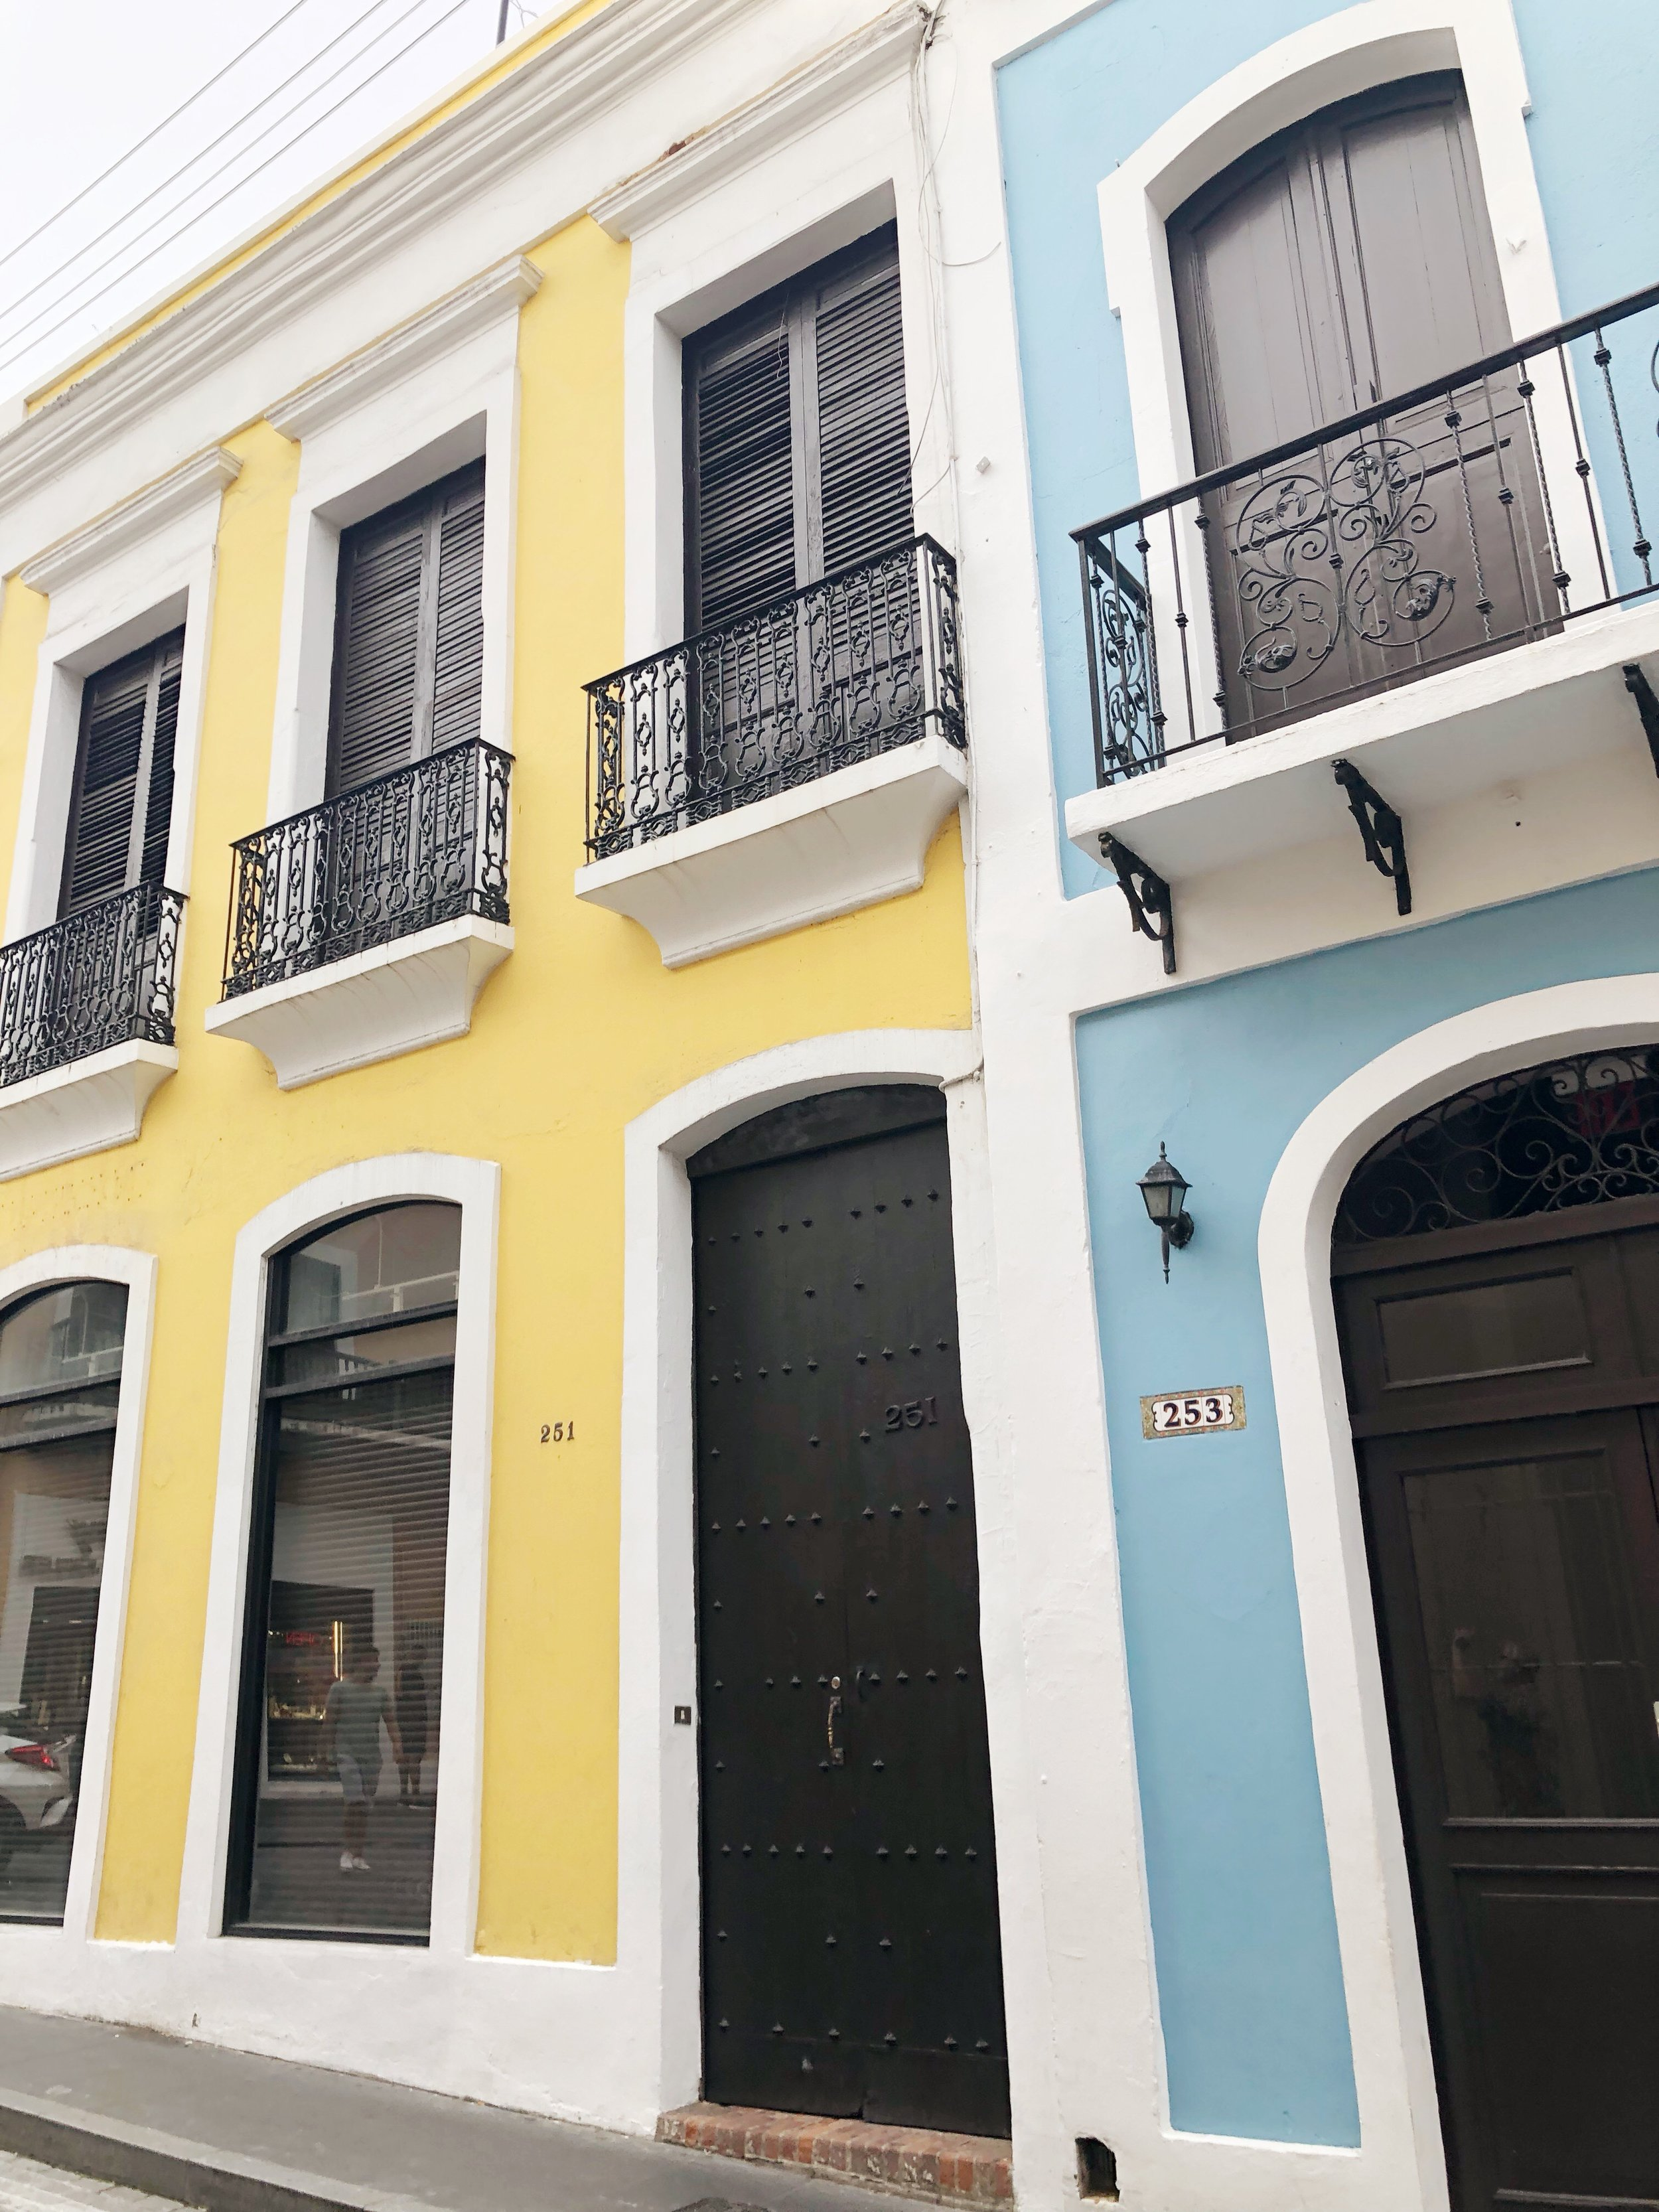 More gorgeous buildings in Old San Juan.